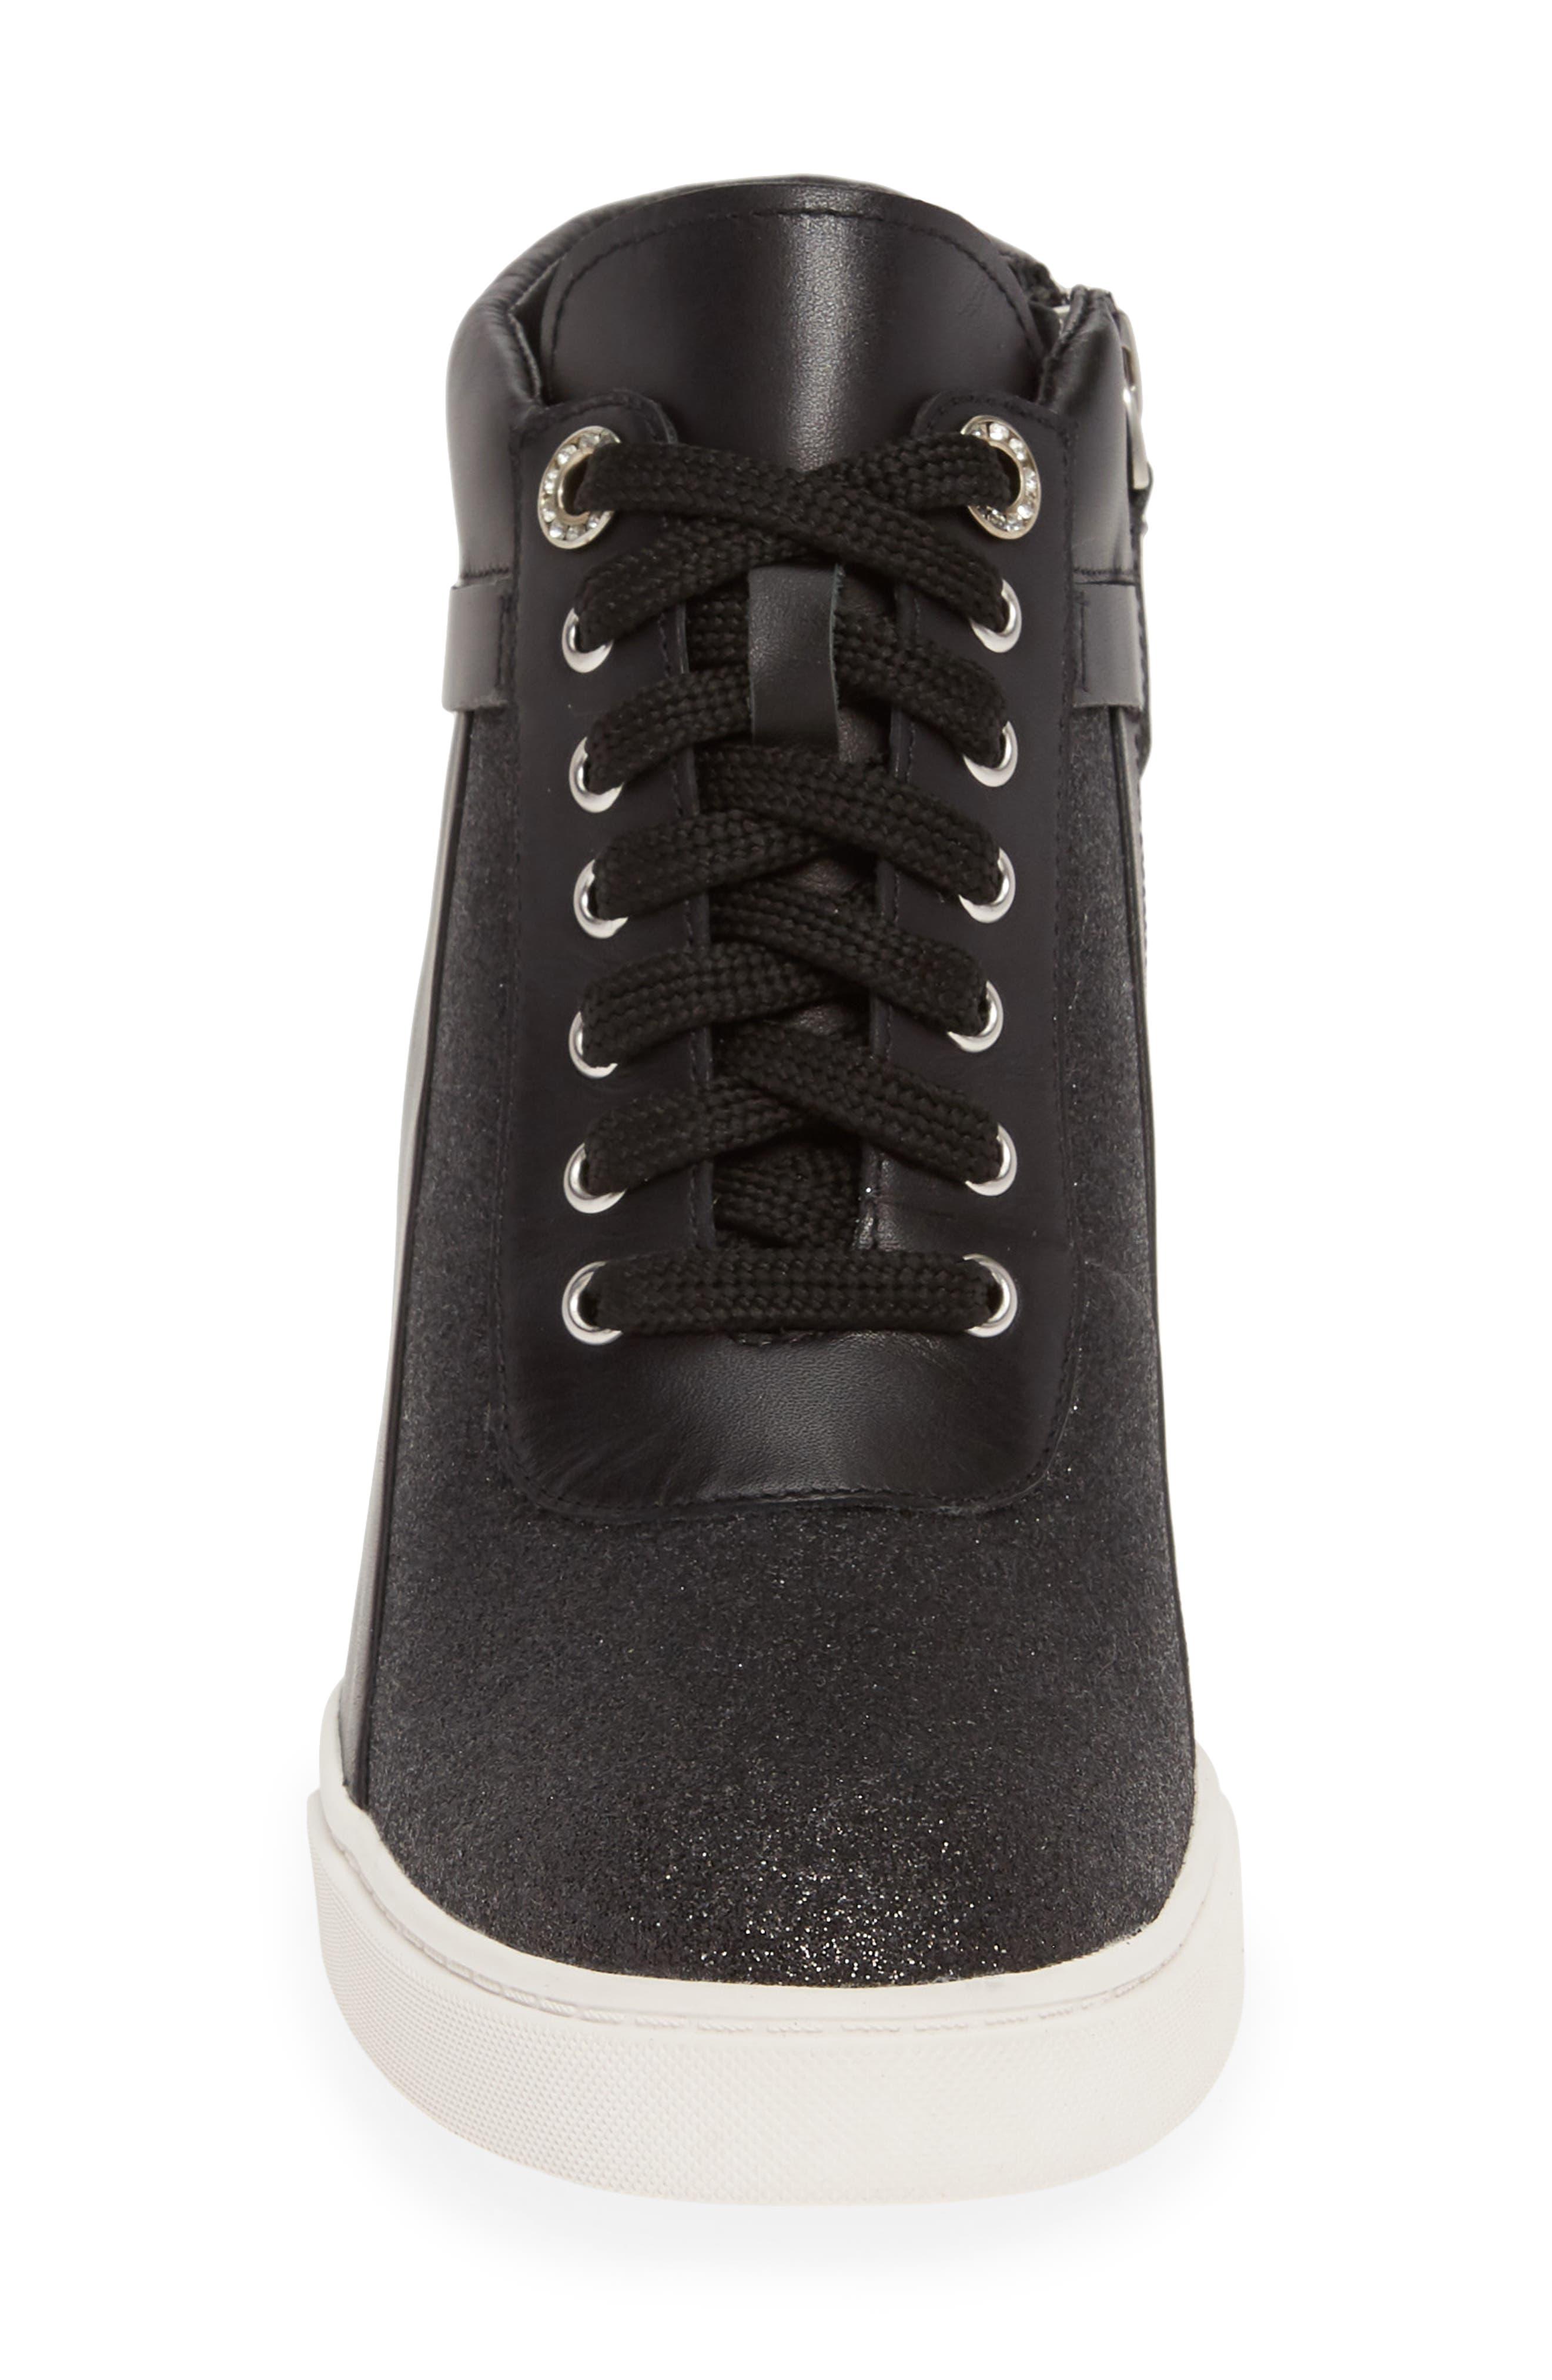 LINEA PAOLO, Freja Wedge Sneaker, Alternate thumbnail 4, color, BLACK GLISTEN LEATHER